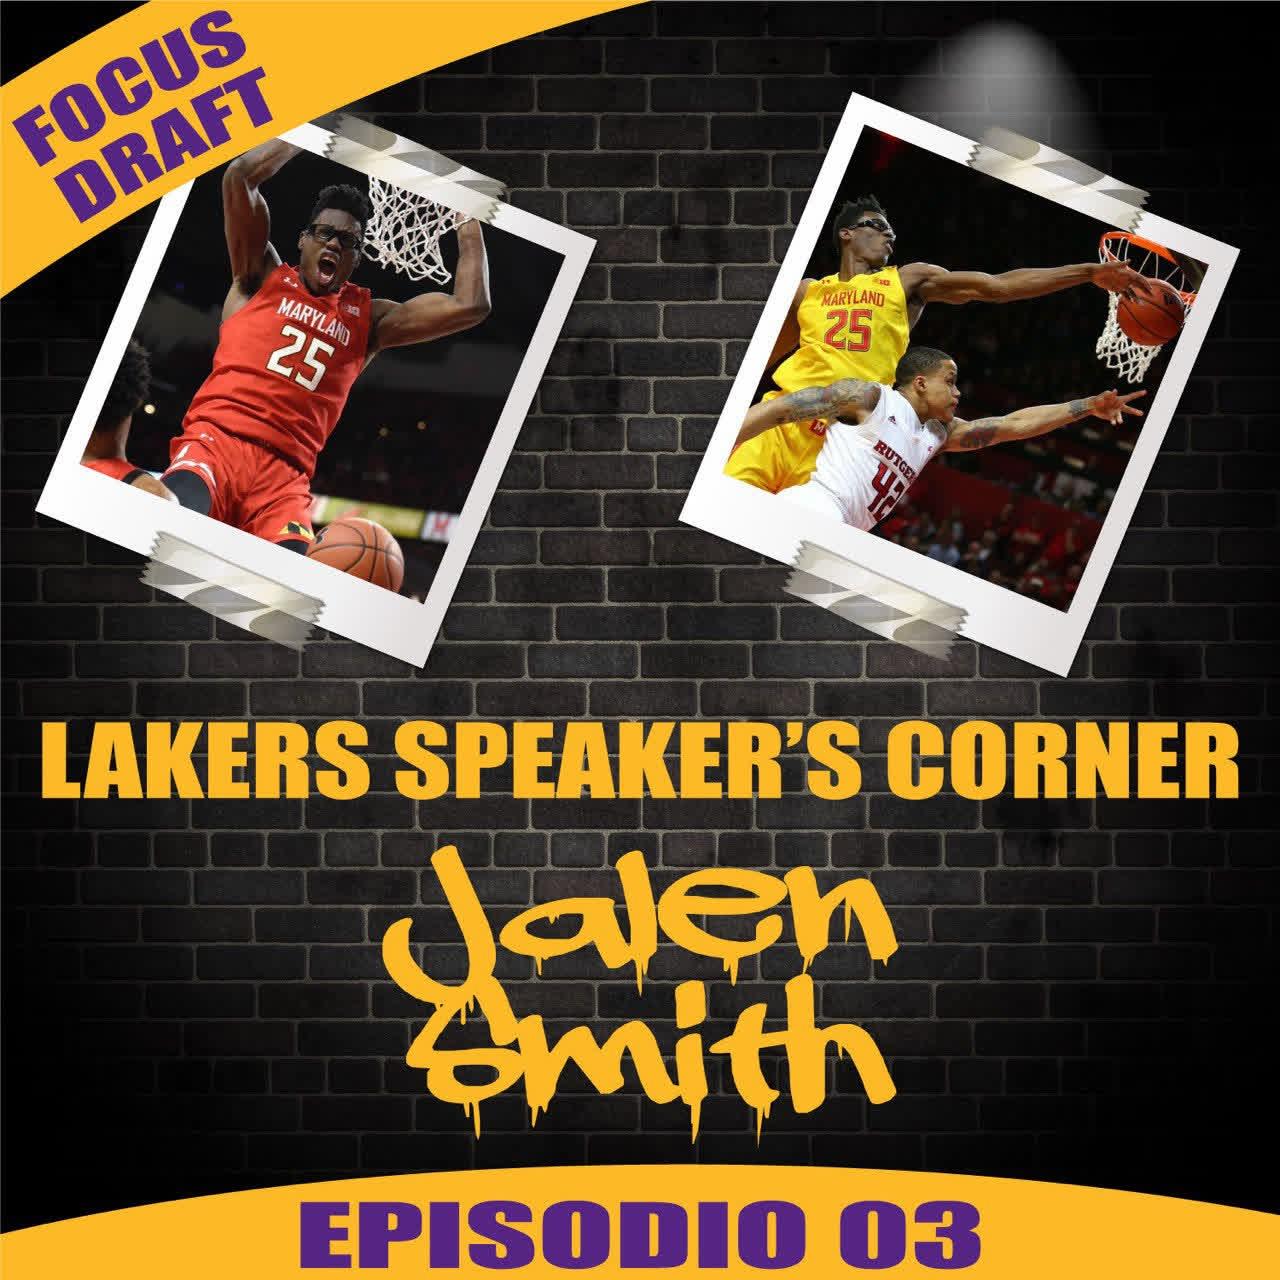 LSC Focus Draft 03: Jalen Smith